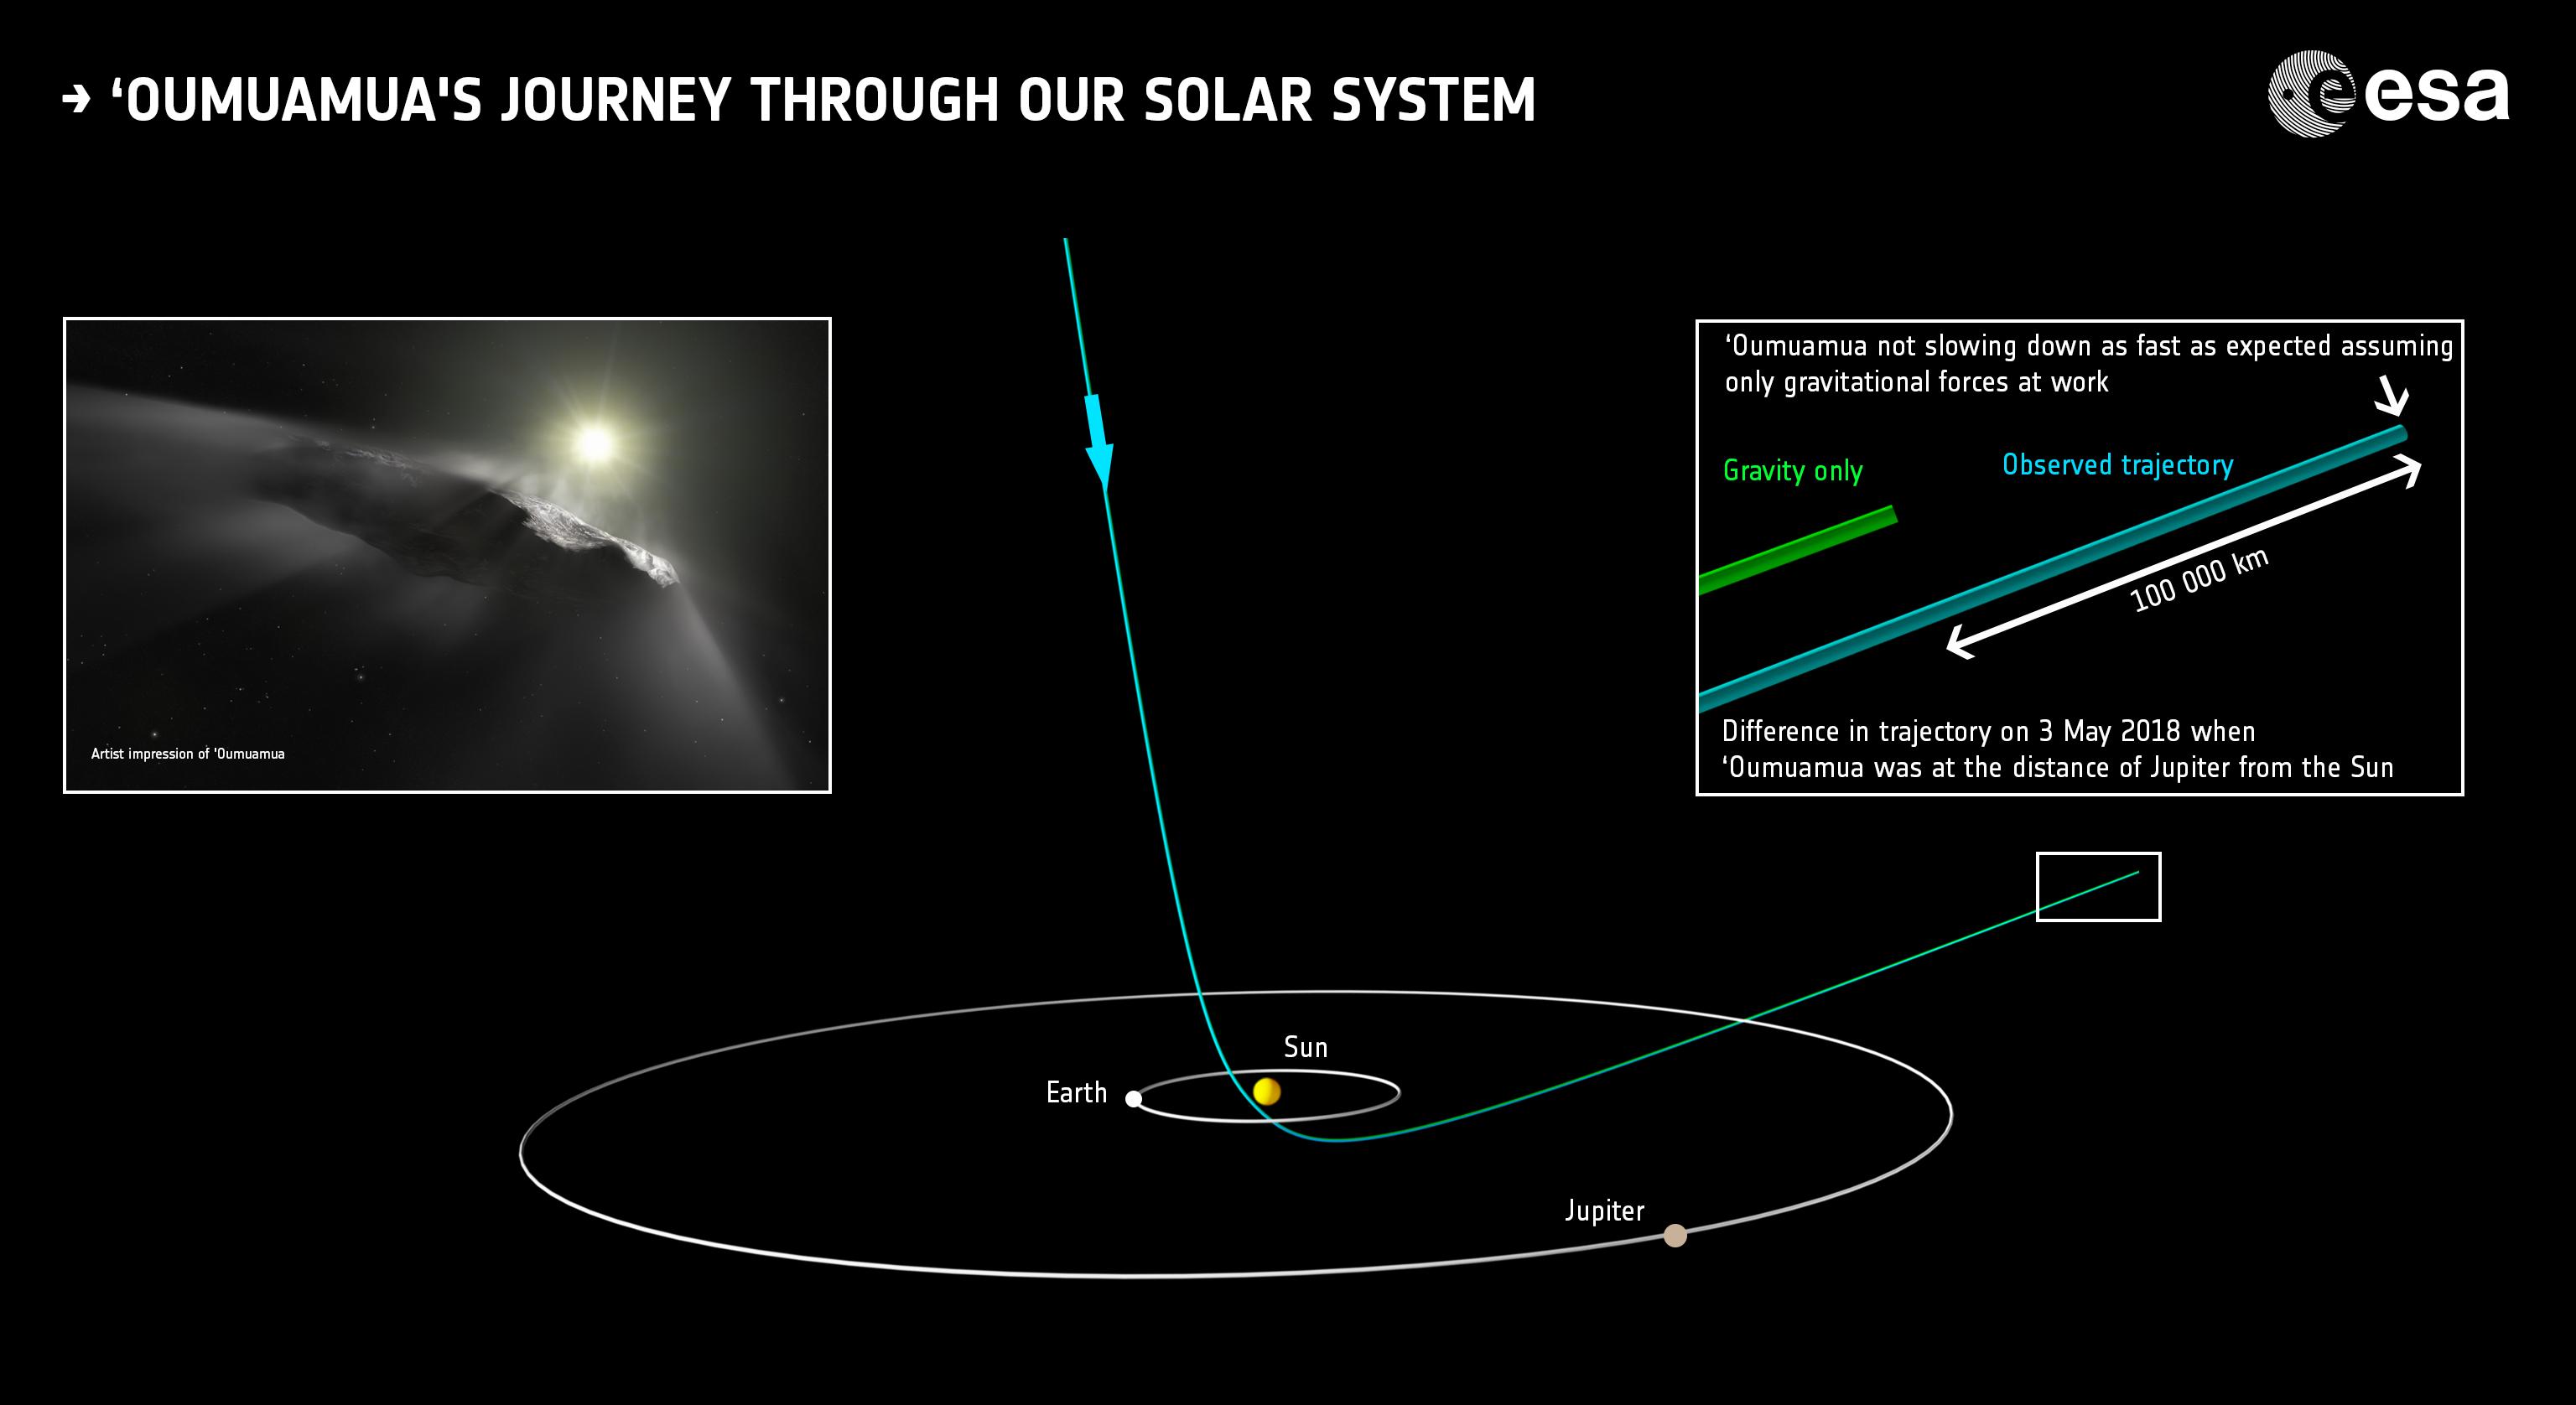 1567213861151-Oumuamua_trajectory_in_Solar_System.jpg